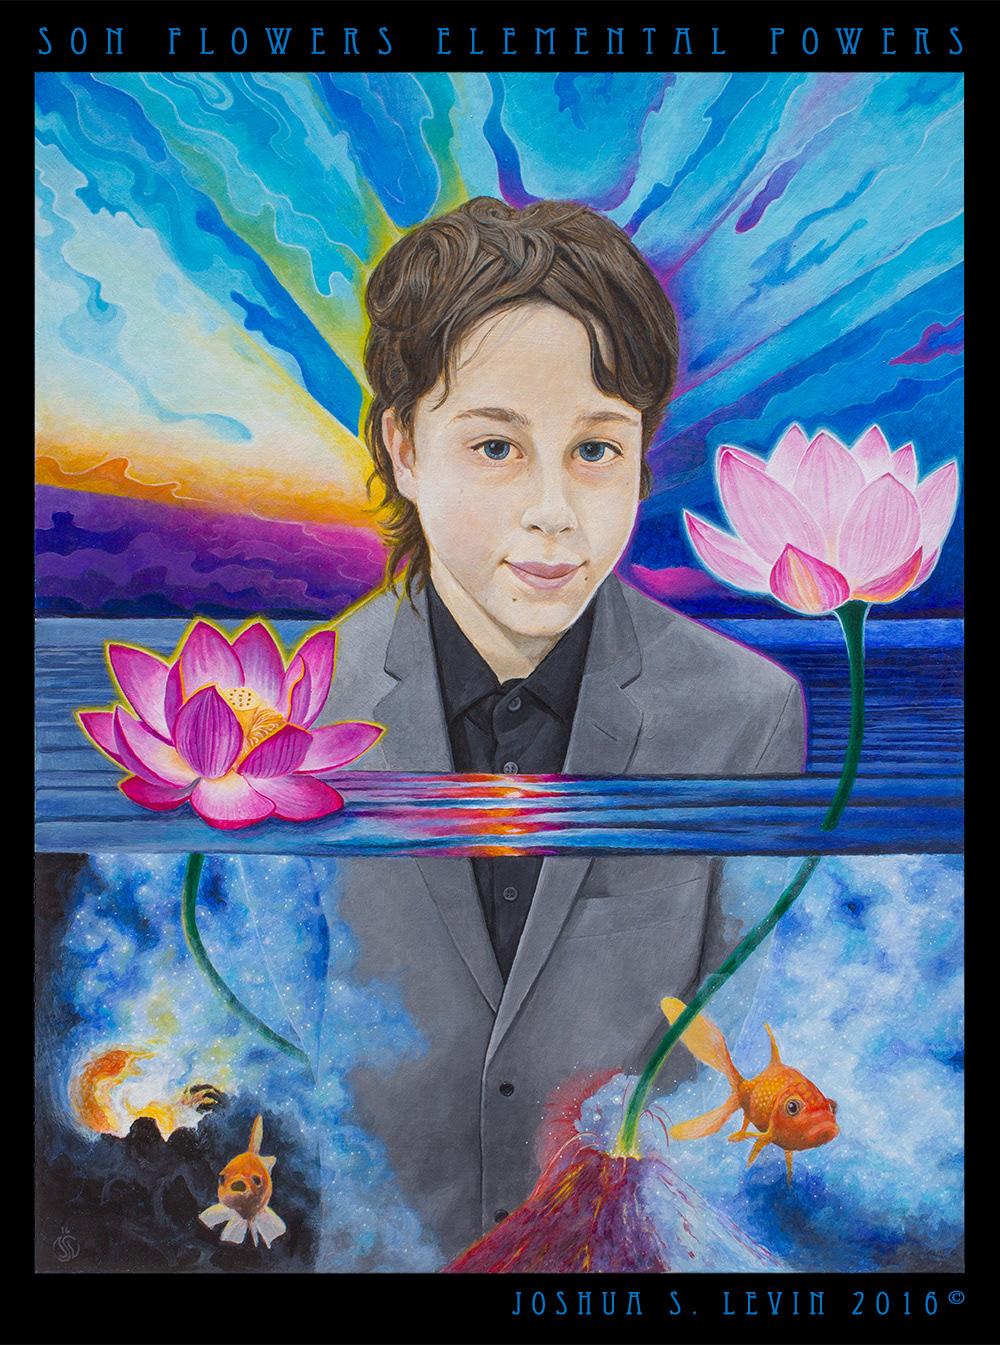 joshua s levin son flowers elemental powers